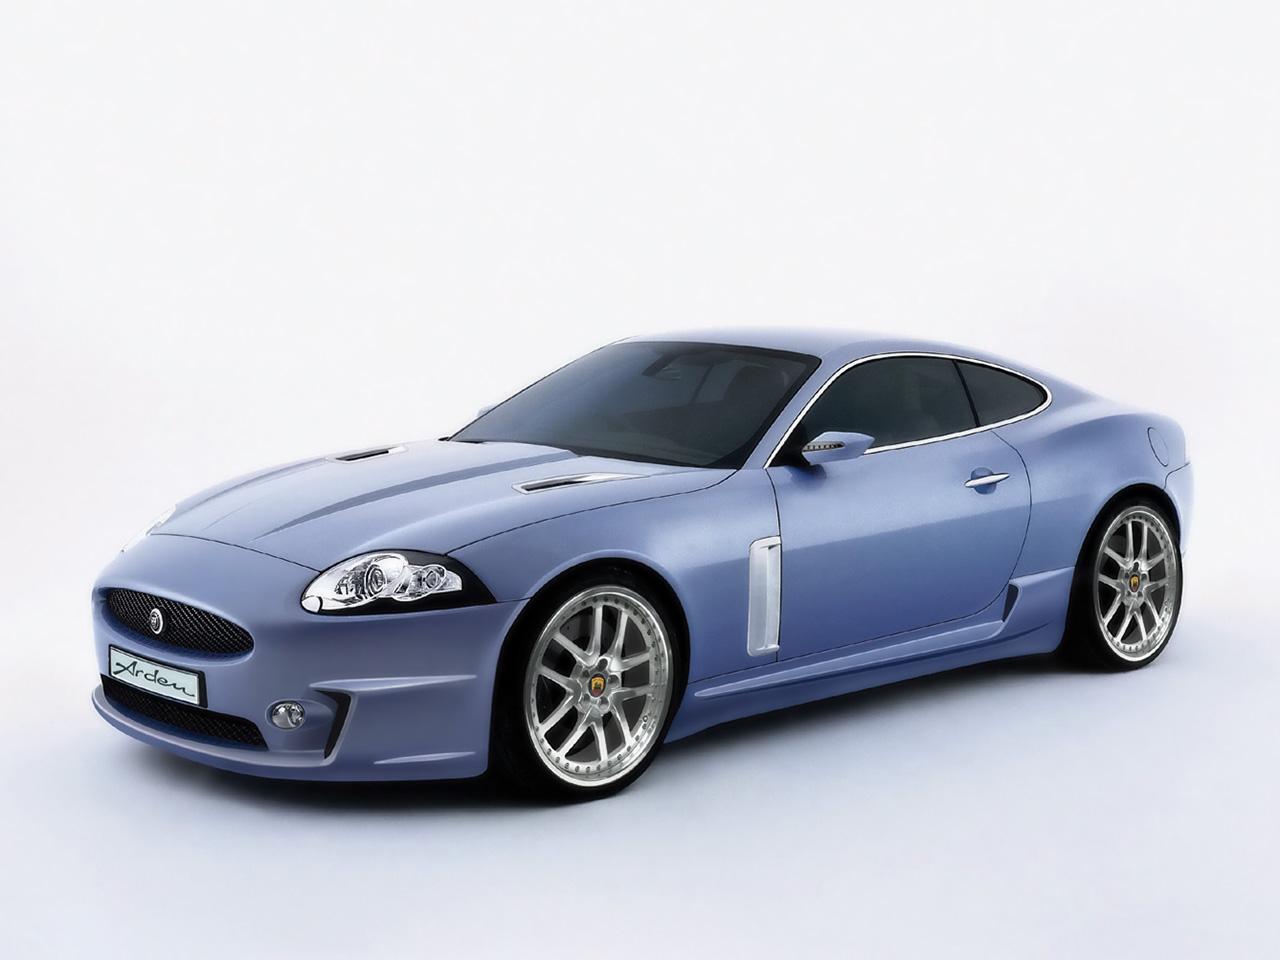 http://4.bp.blogspot.com/_bqUFmud0syE/TAd-AQsRxuI/AAAAAAAAAaU/jy45BKjDSYU/s1600/2007-Arden-Jaguar-XK-AJ-20-Coupe-Front-And-Side-1280x960.jpg